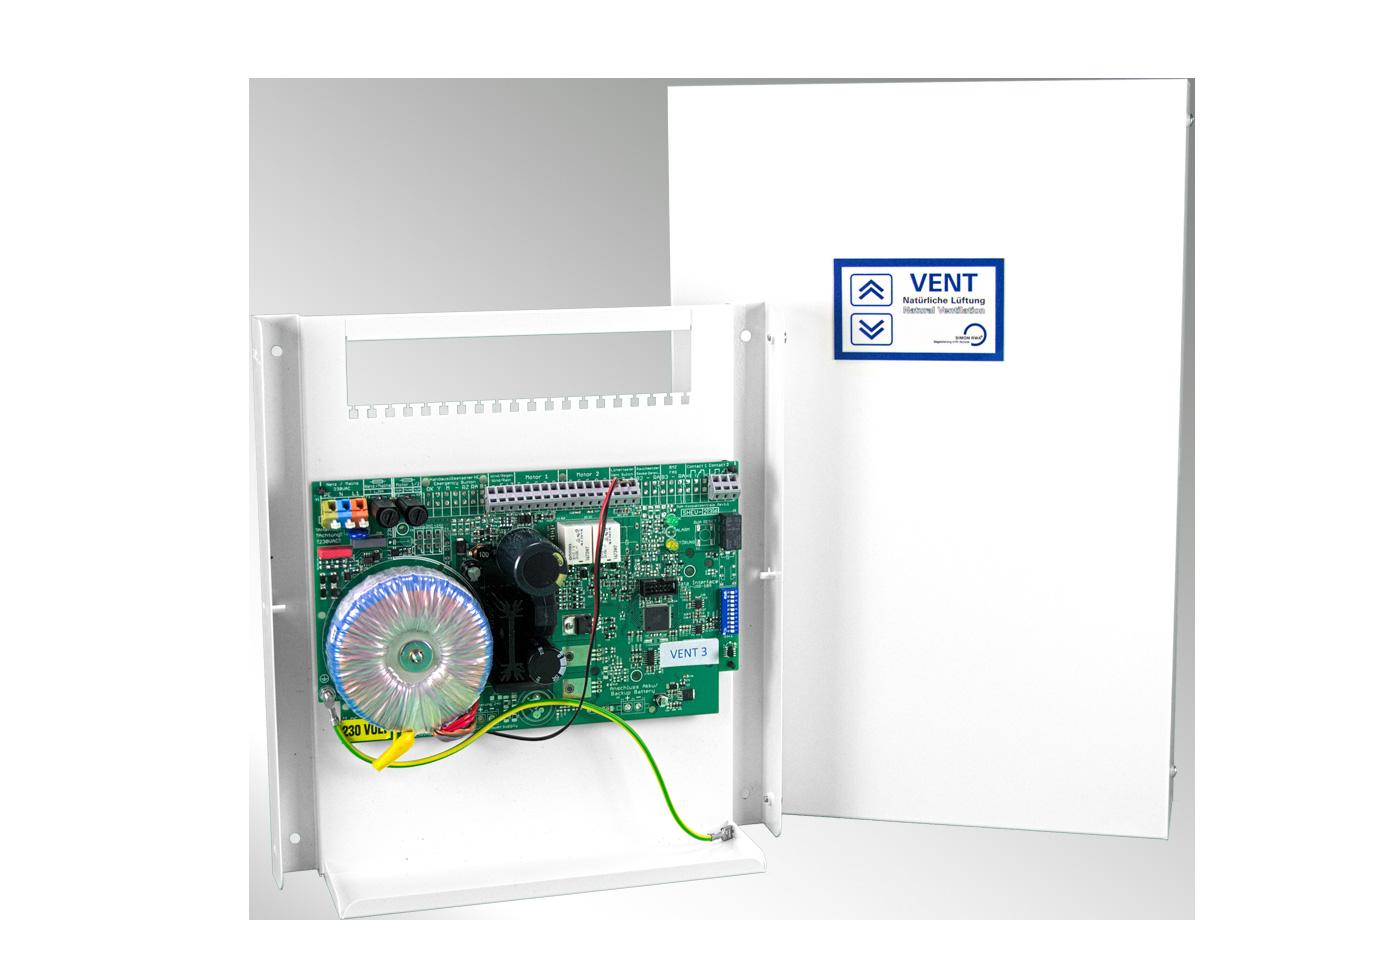 Controlled Ventilation - VENT 3/6 ventilation panel